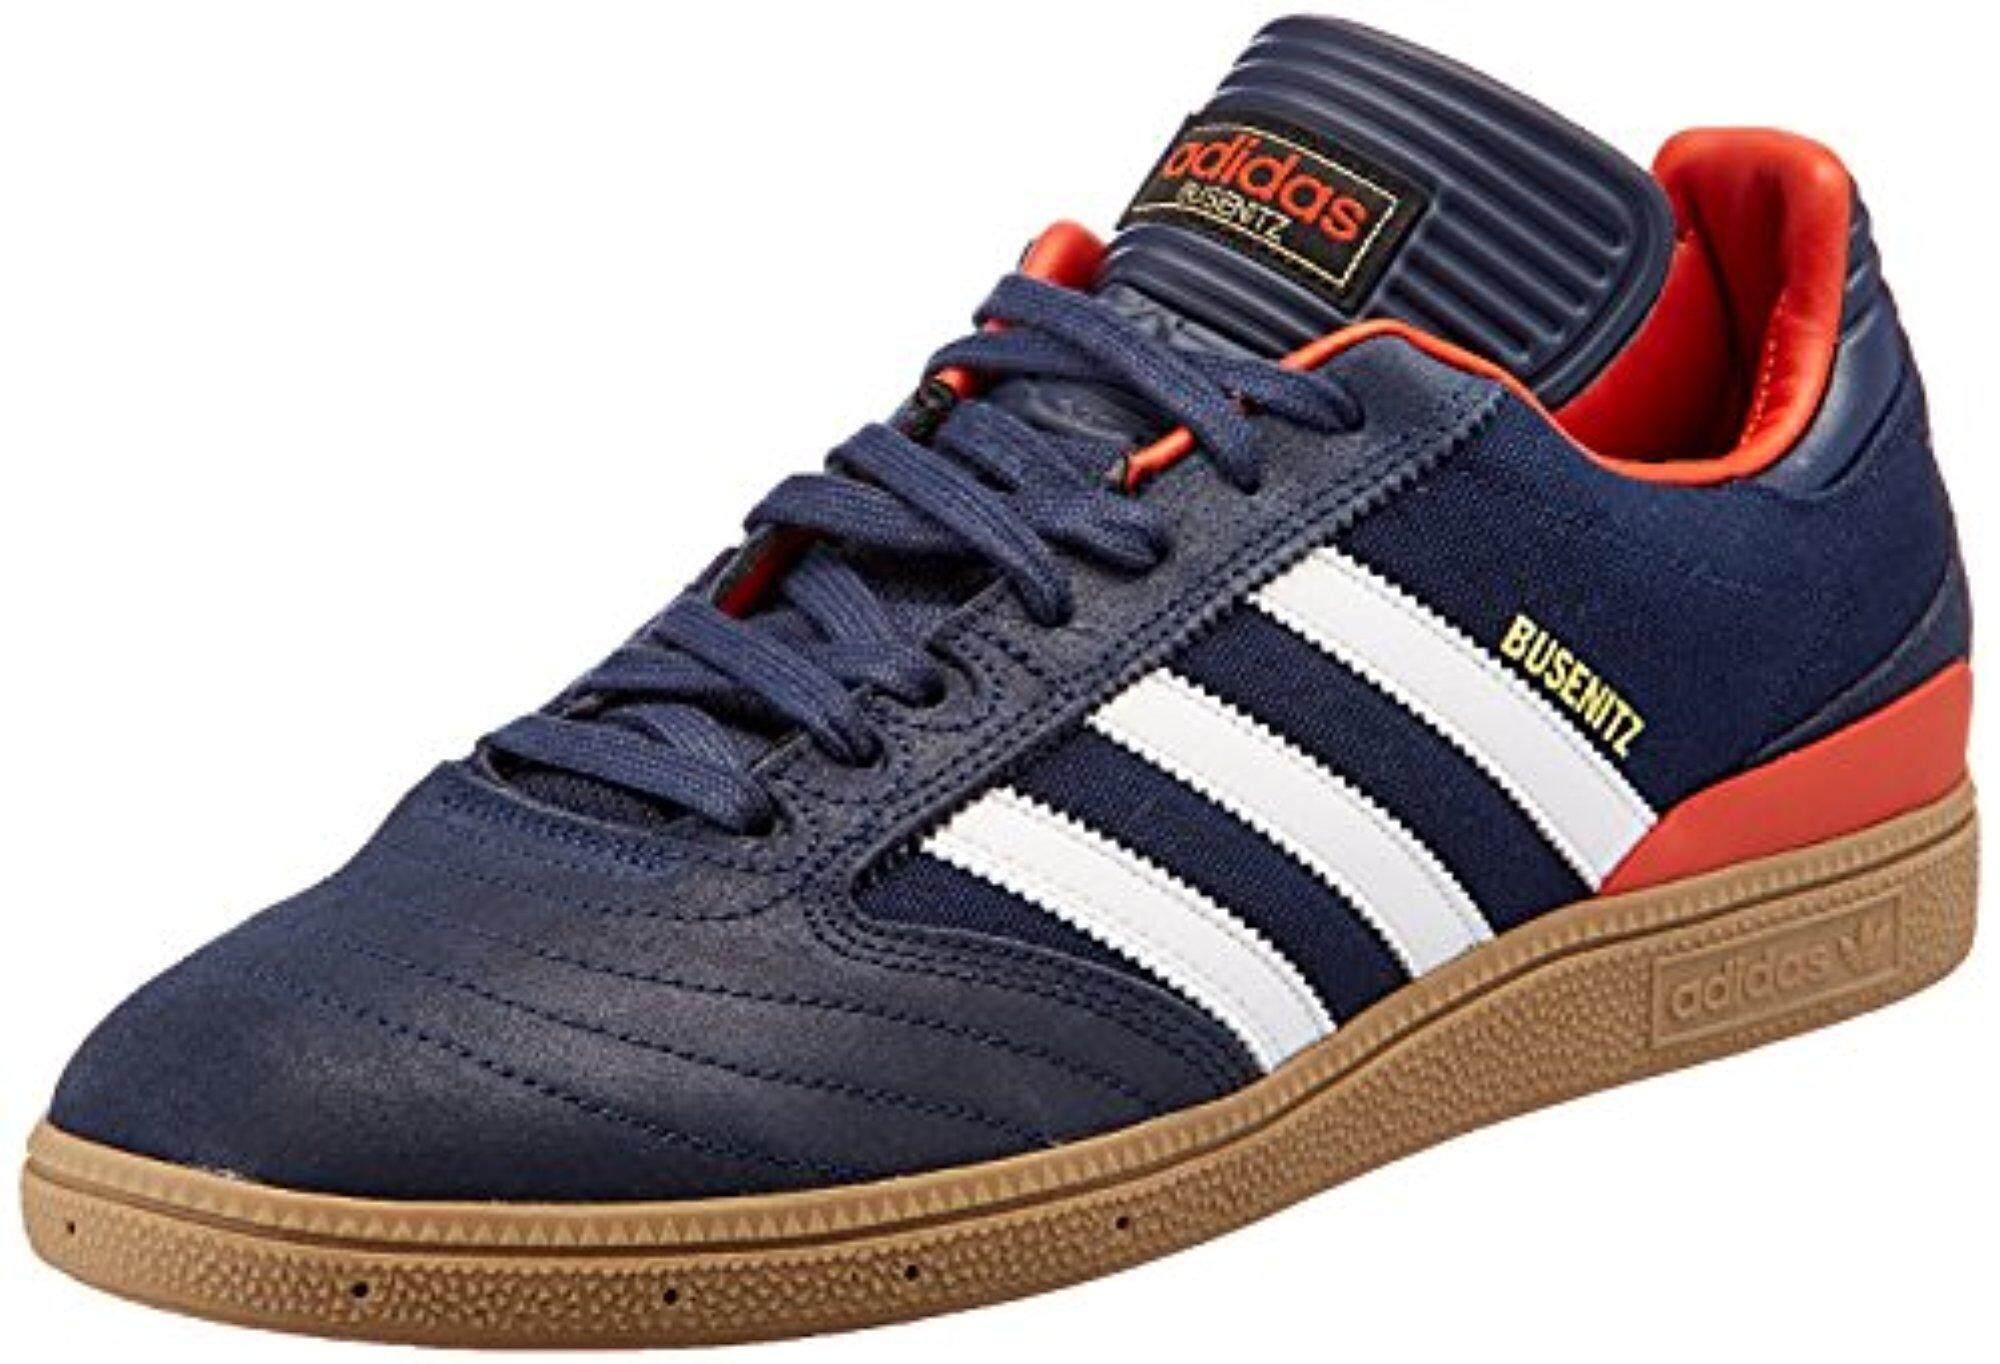 adidas Originals Men's Busenitz Conavy, Ftwwht and Crachi Leather Skateboarding Shoes - 11 UK/India (46 EU) - intl